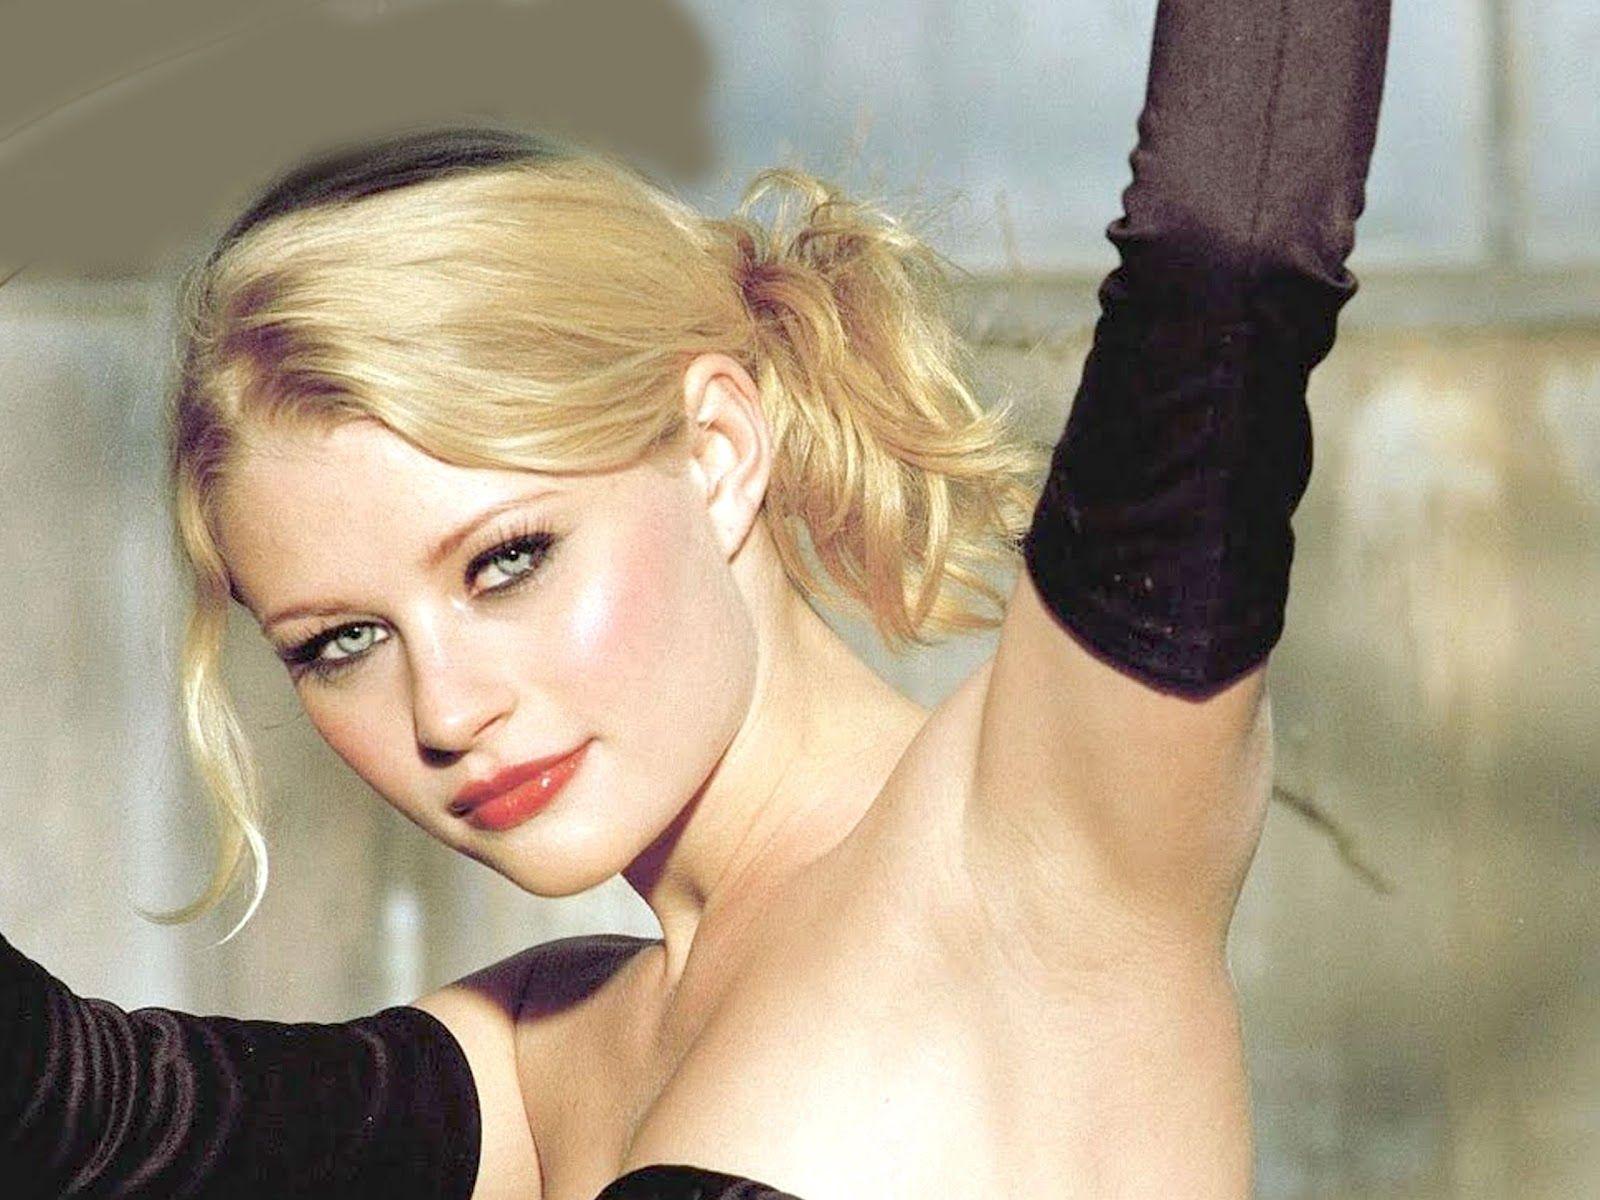 Hot Emilie De Ravin Wallpapers Wallpapers Emilie De Ravin Mistresses Tv Show The Hills Have Eyes